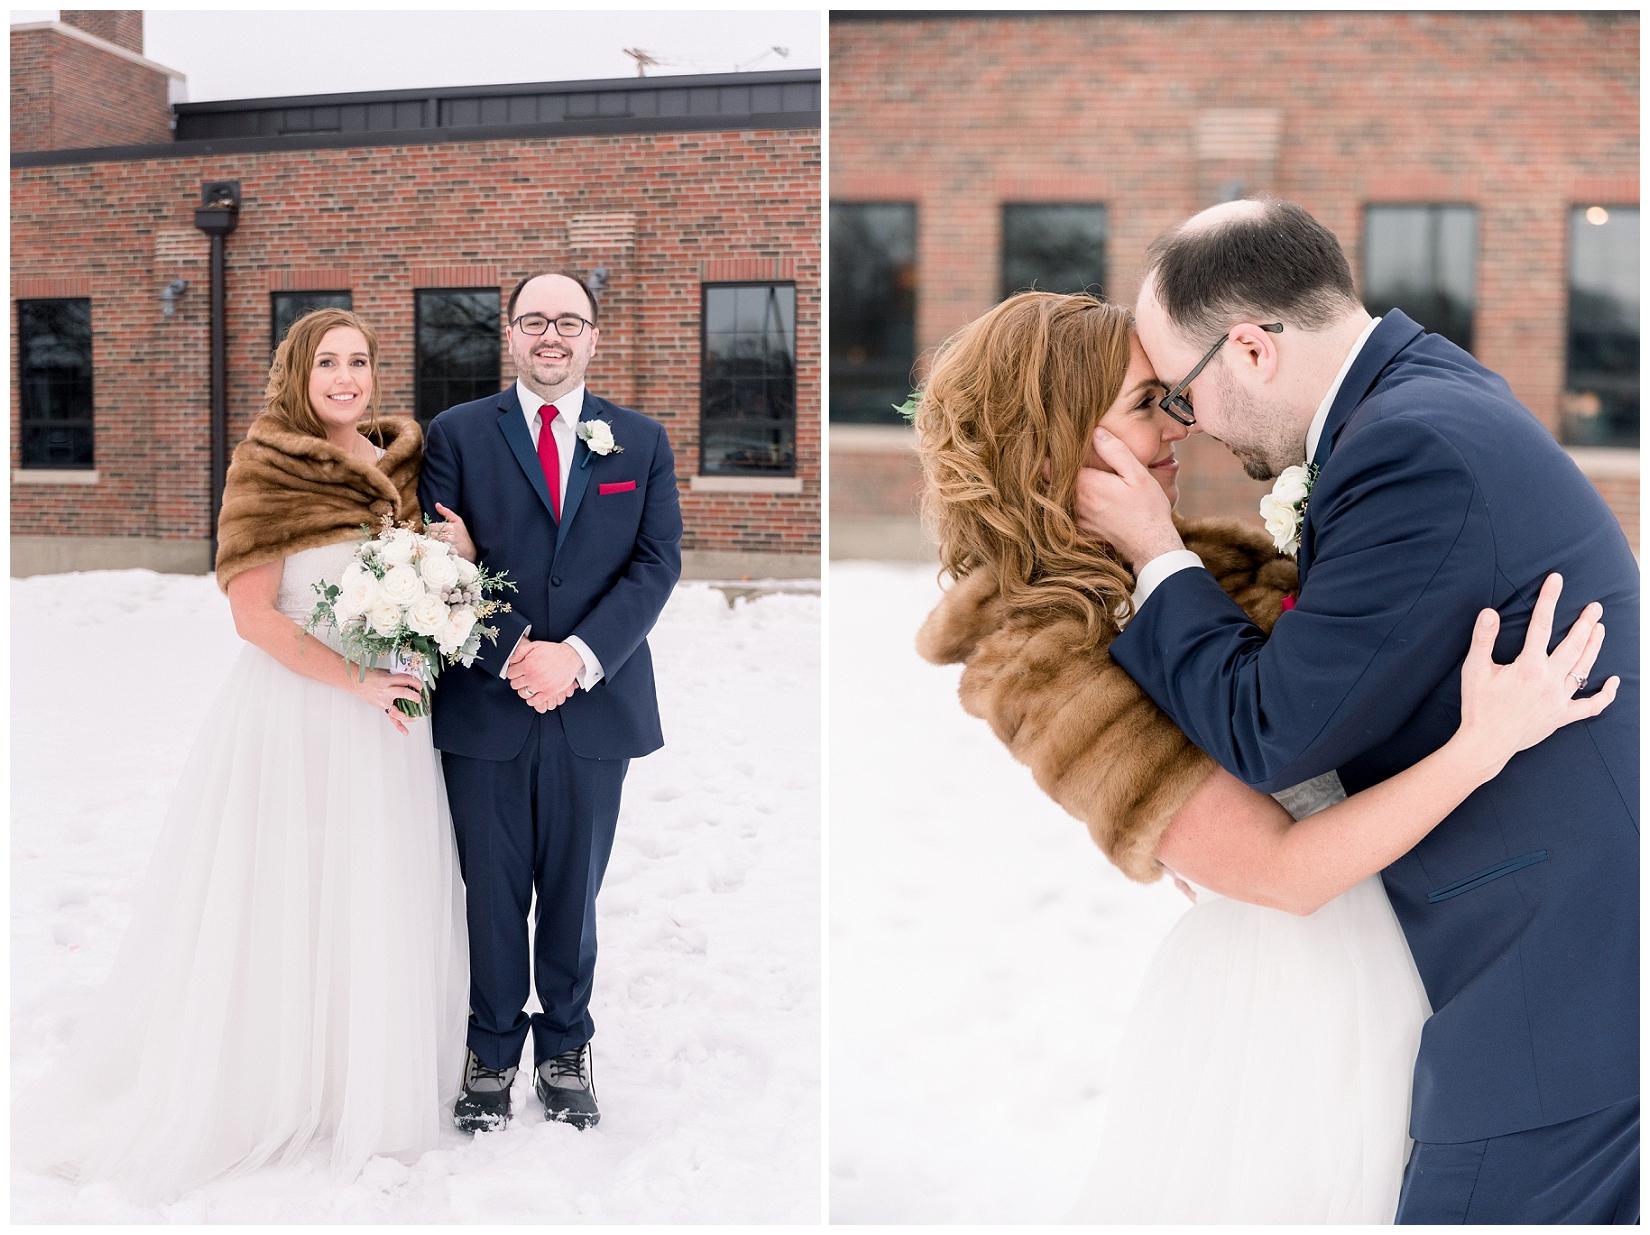 cat-alkire-wedding-photographer-indiana-chicago-indianapolis-fort-wayne_0969.jpg